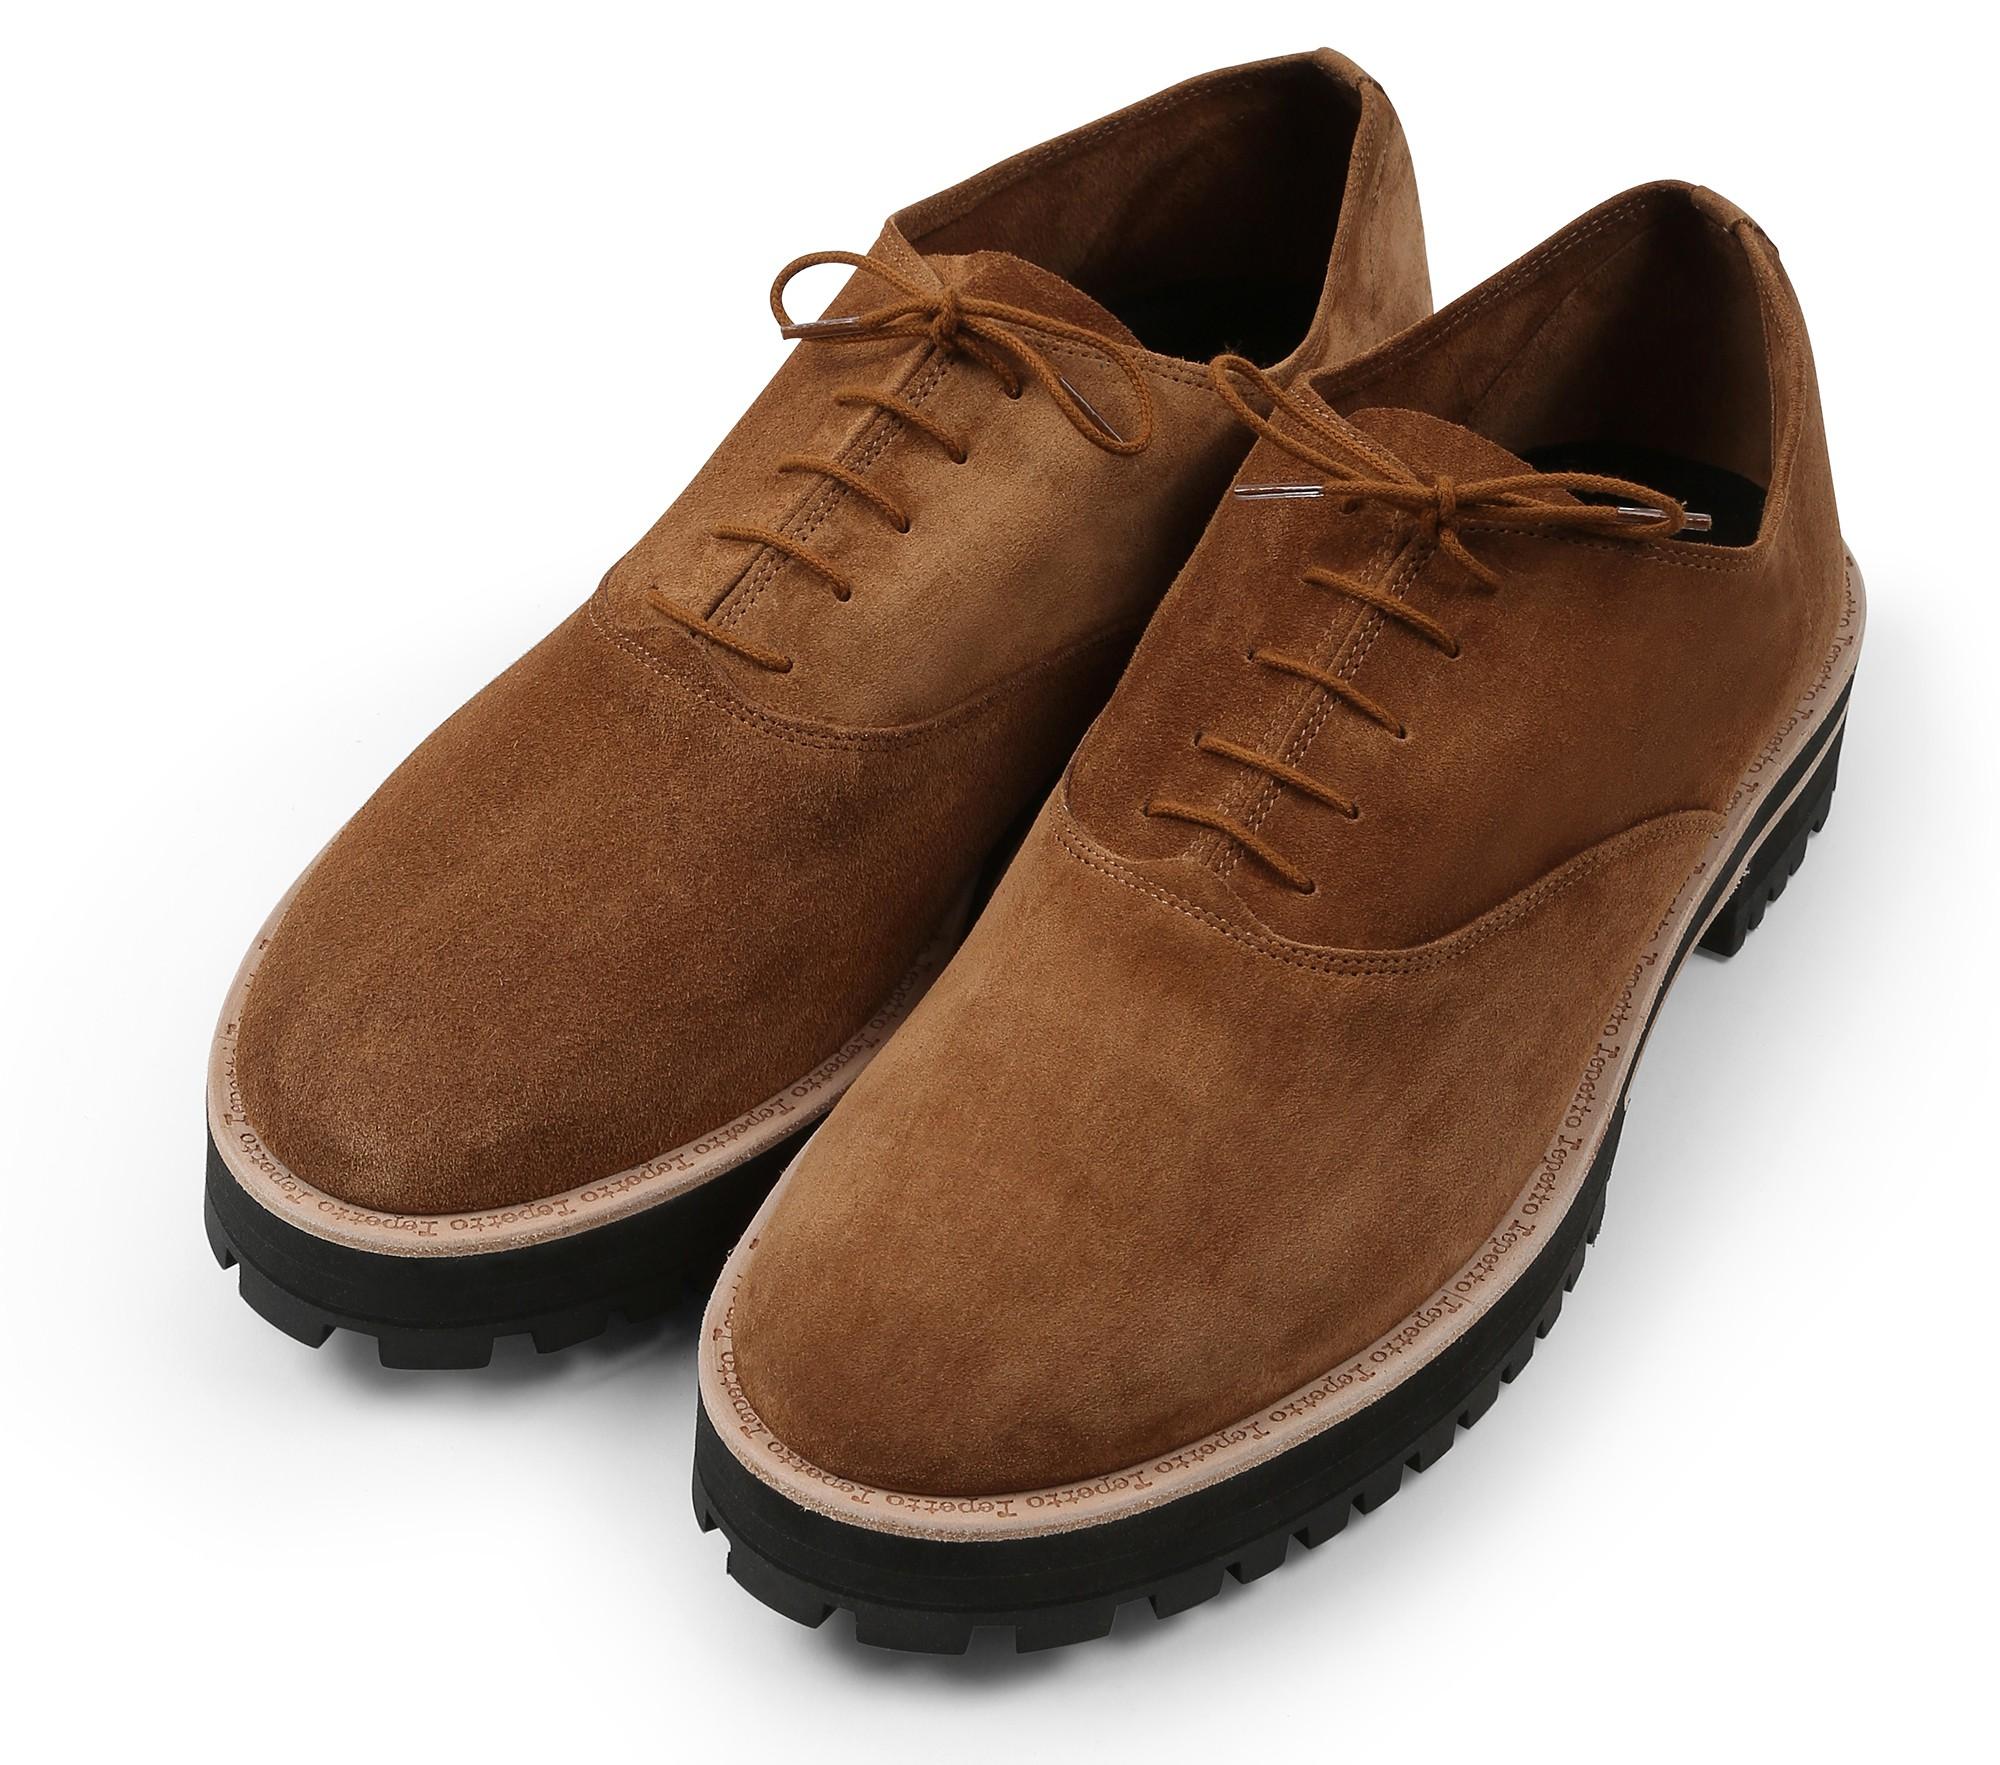 Gianni Oxford Shoe - Man